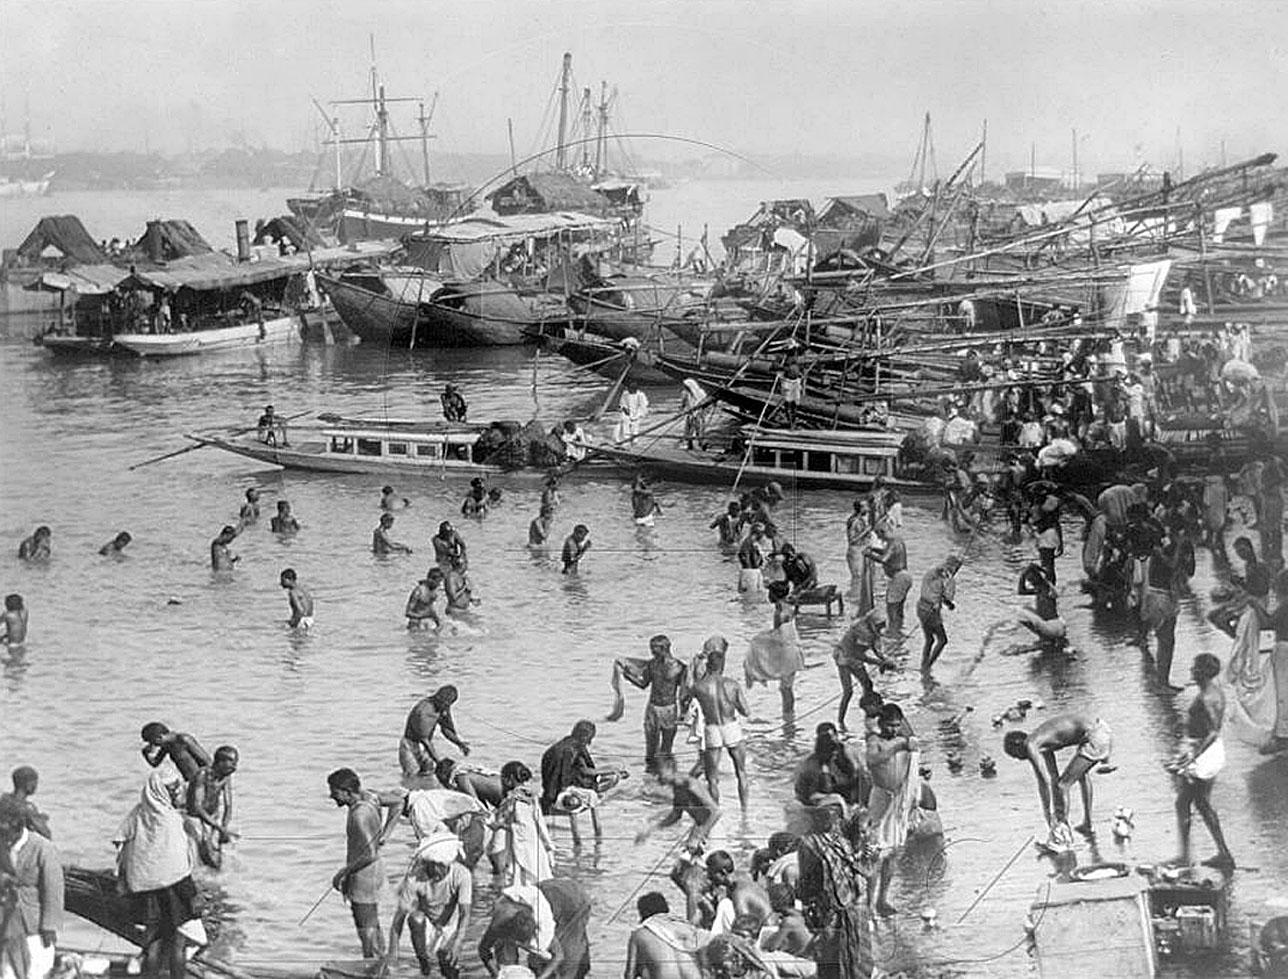 1894 Bathing in the Chao Phraya.jpg